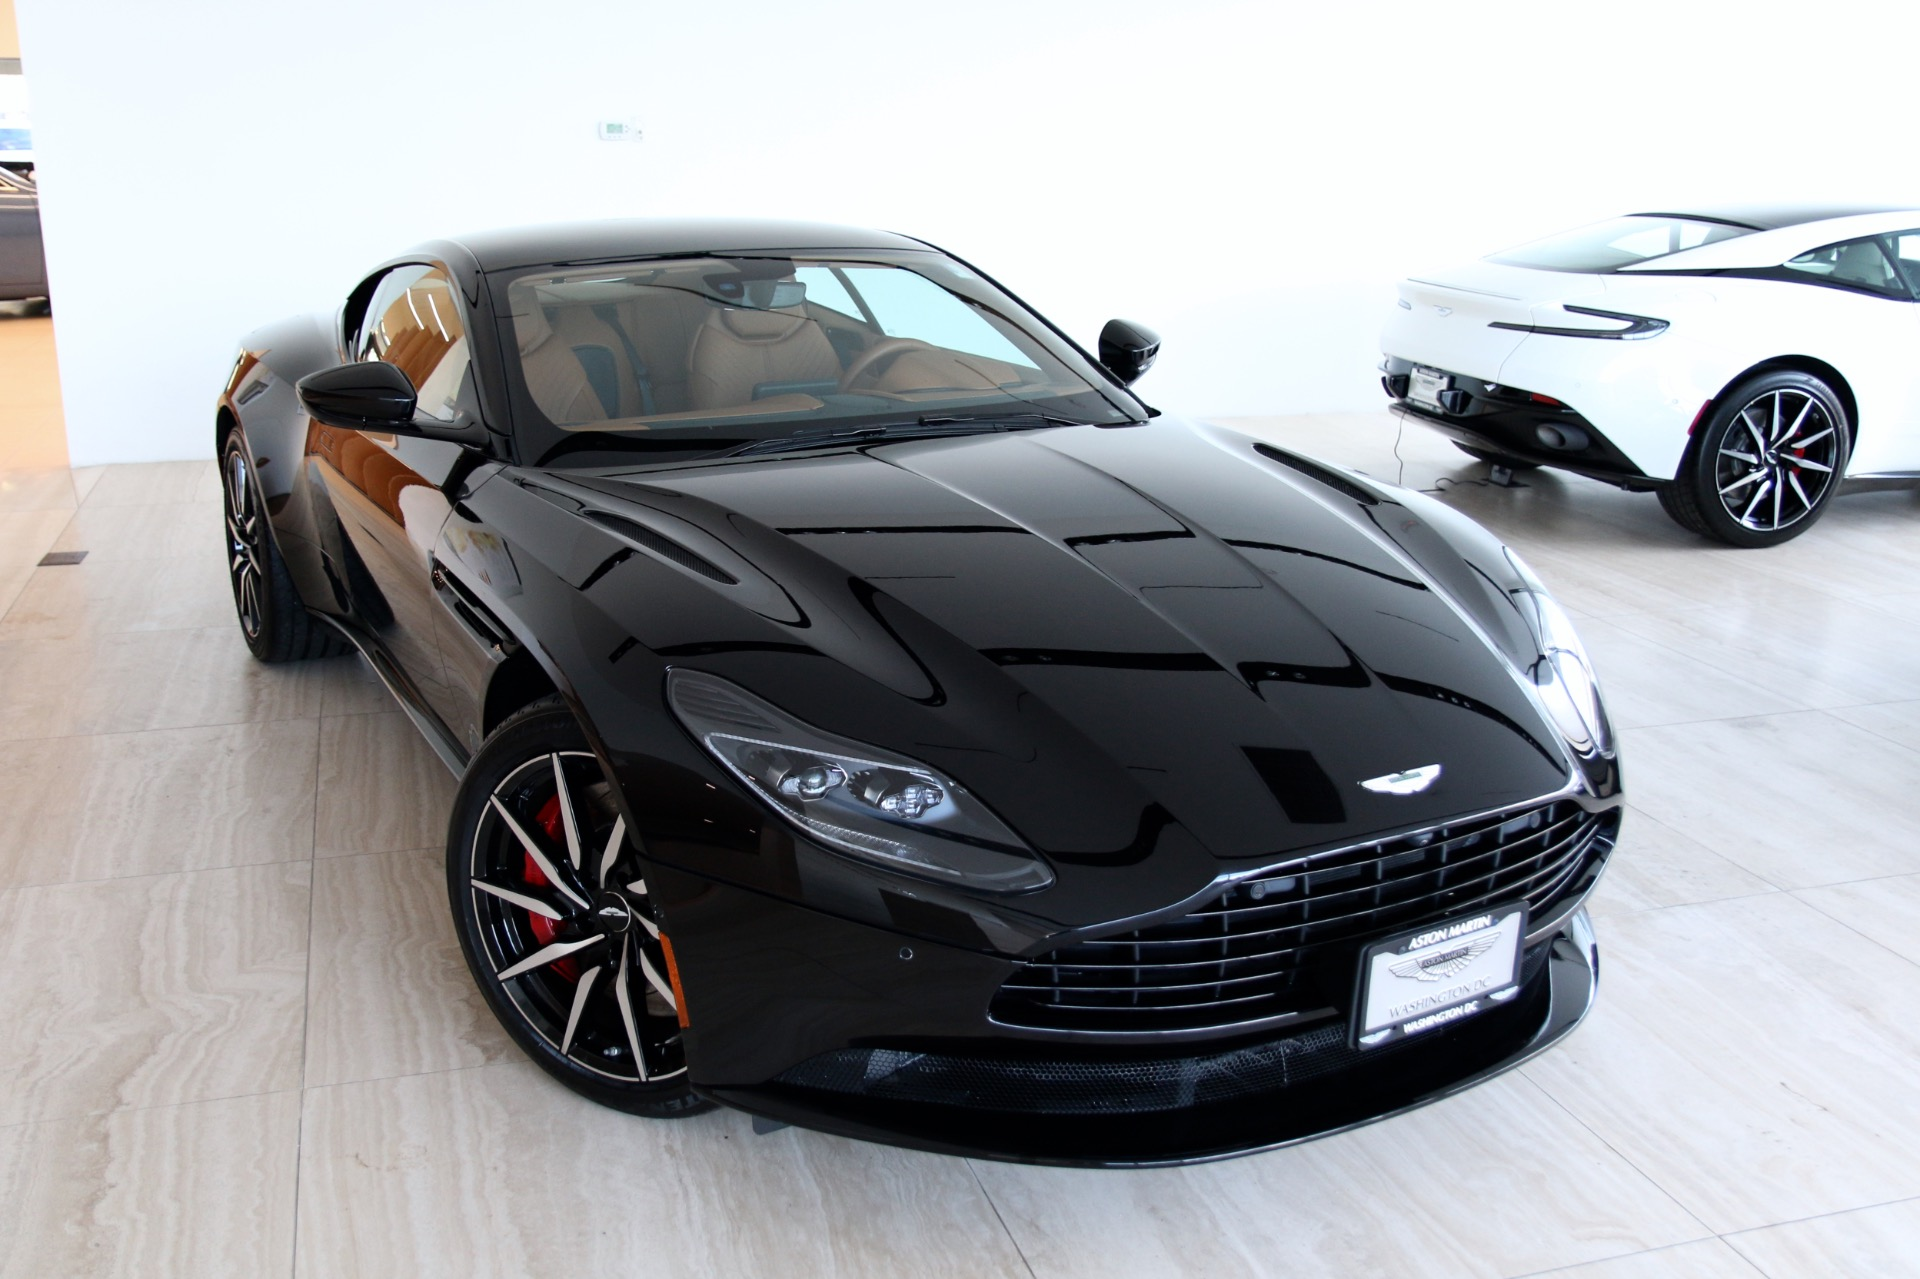 2018 Aston Martin Db11 V8 Stock 8l04040 For Sale Near Vienna Va Va Aston Martin Dealer